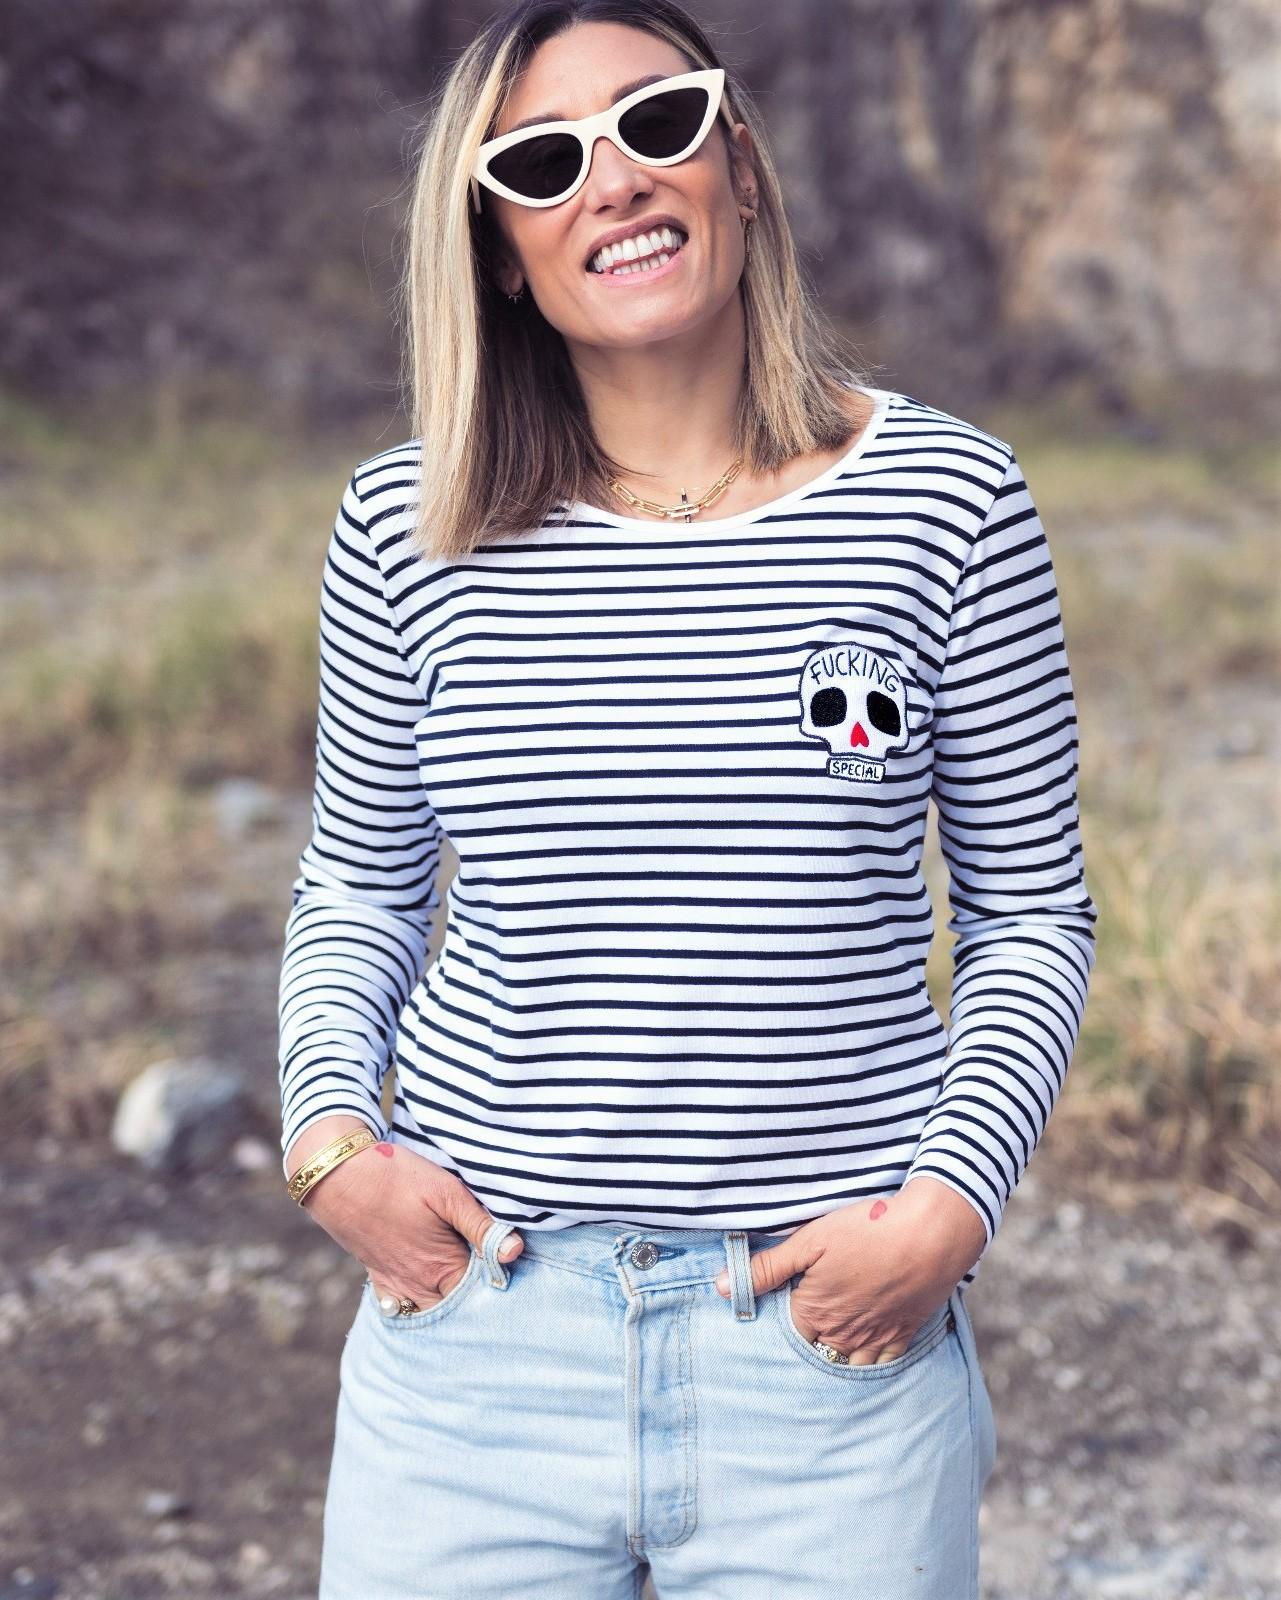 Camiseta de rayas estilo marinero manga larga con bordado en el pecho.